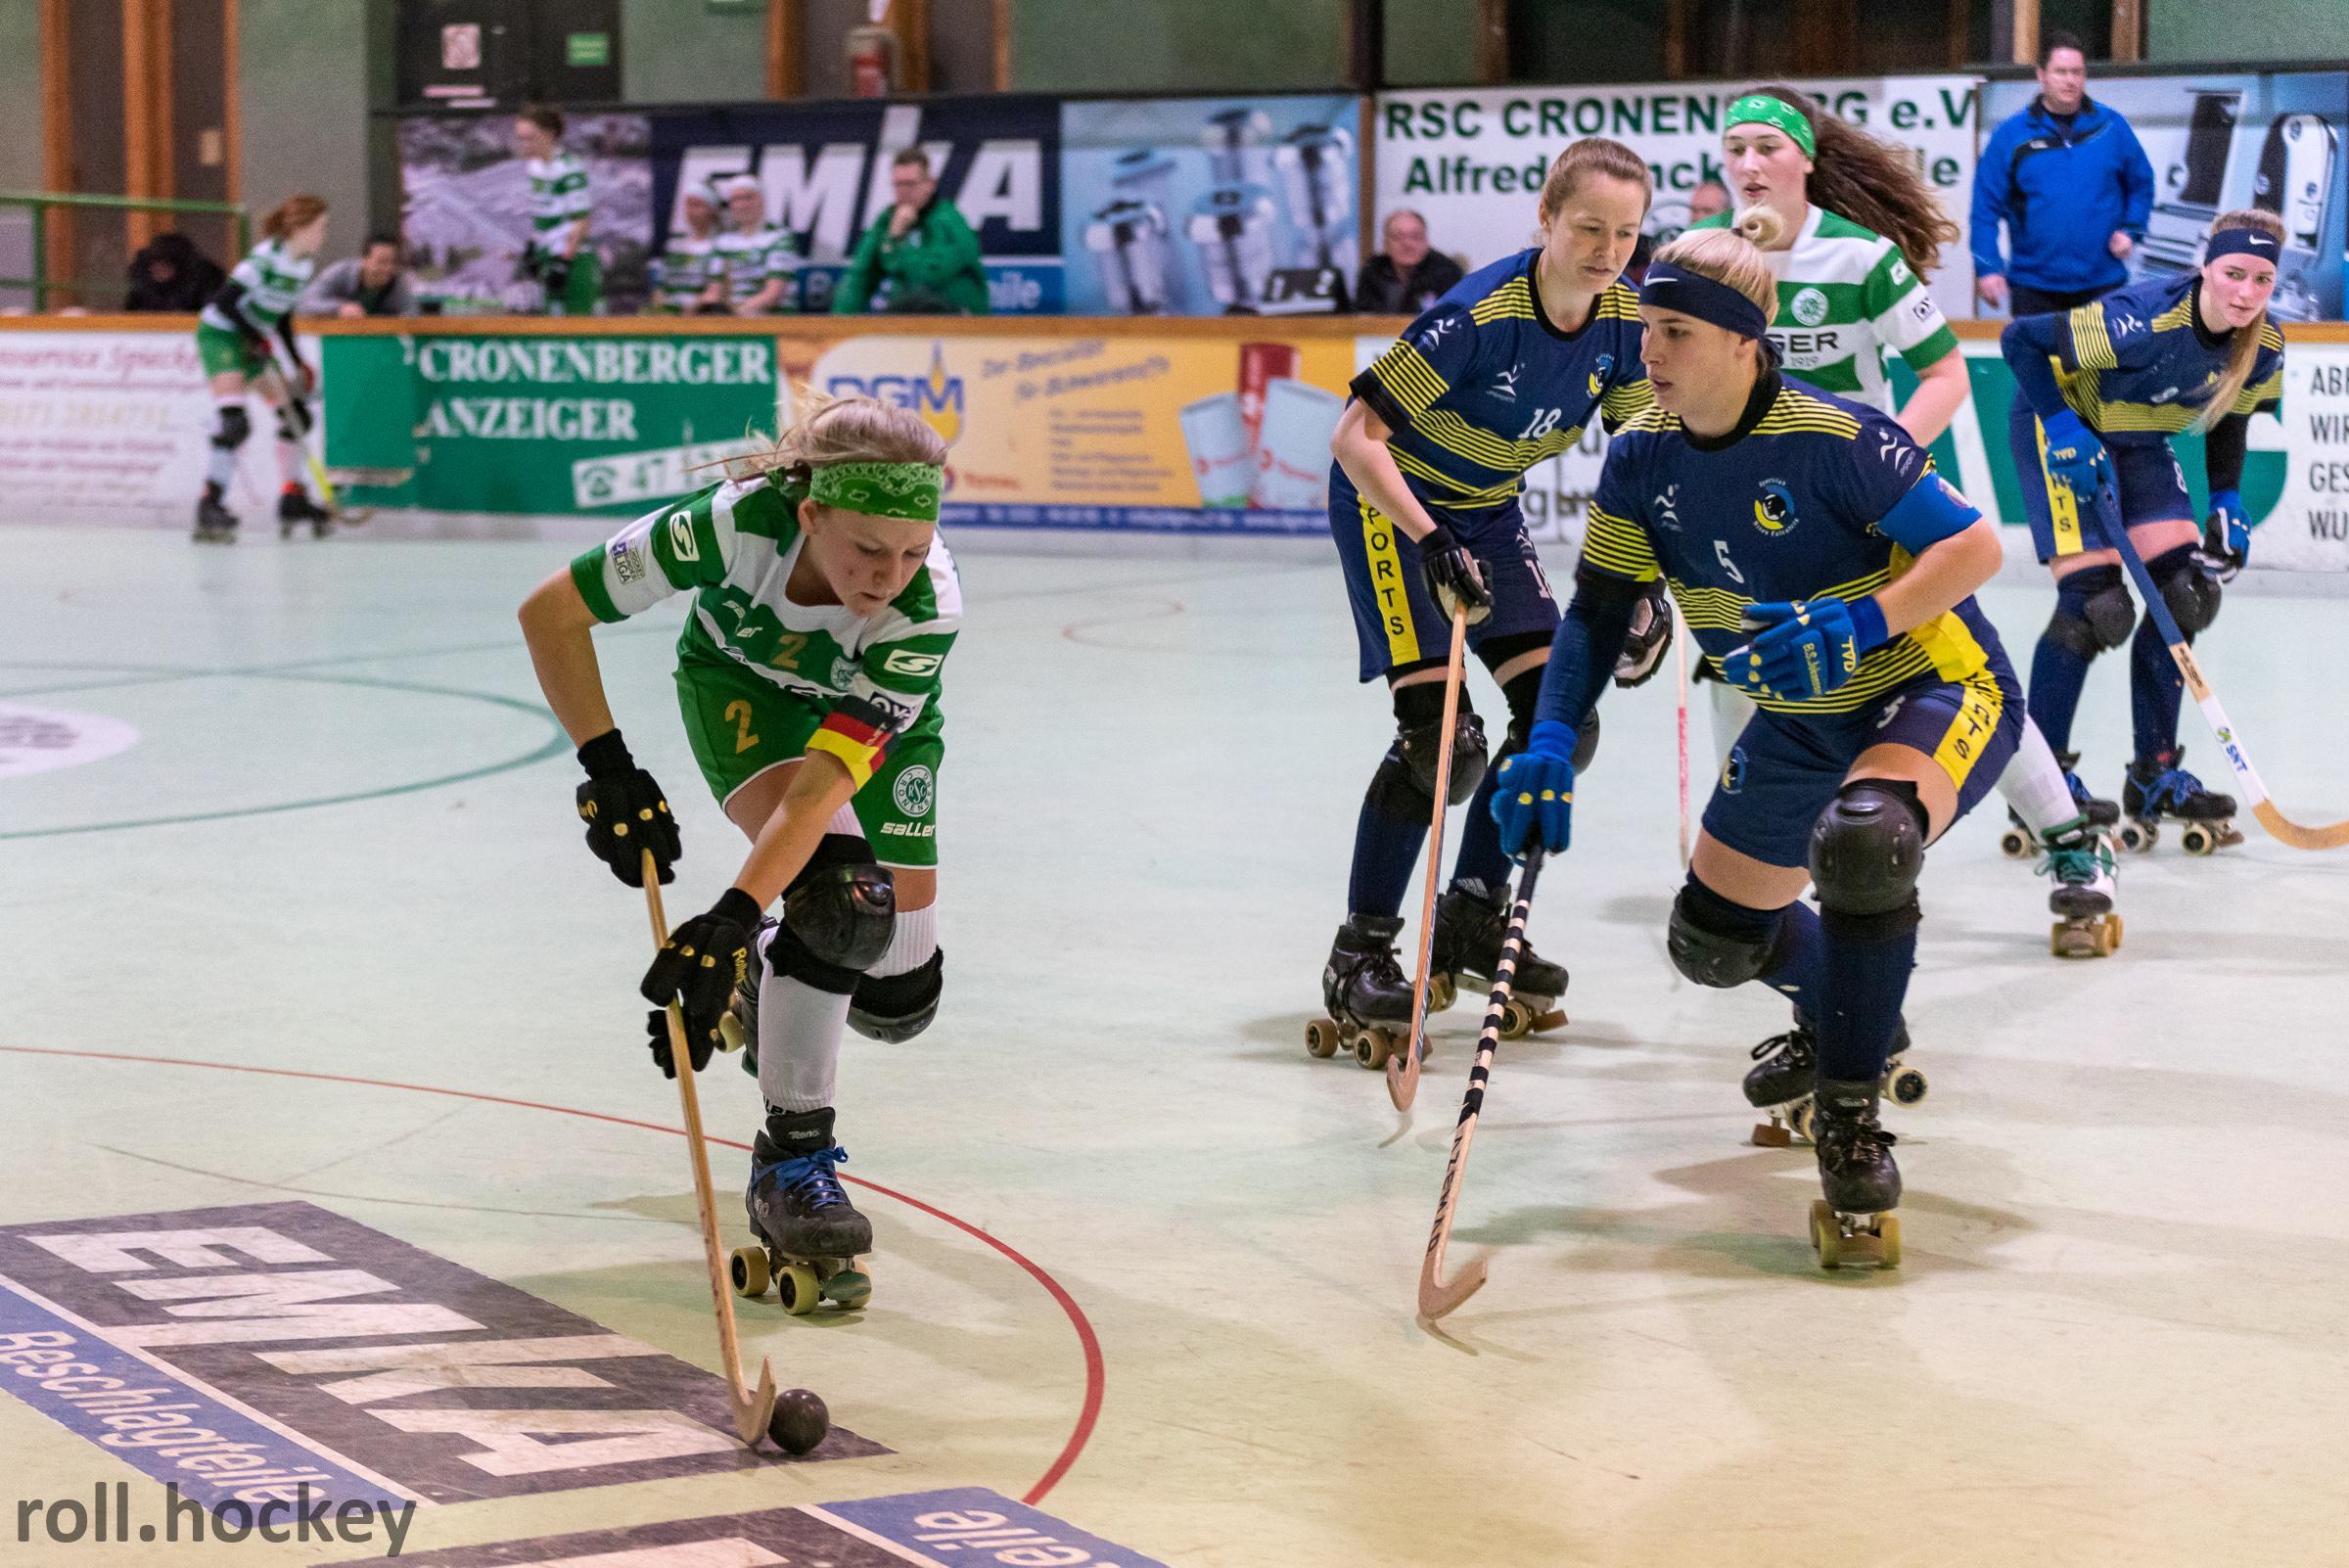 RSC Cronenberg Rollhockey Bundesliga Damen Spieltag 02.02.2019